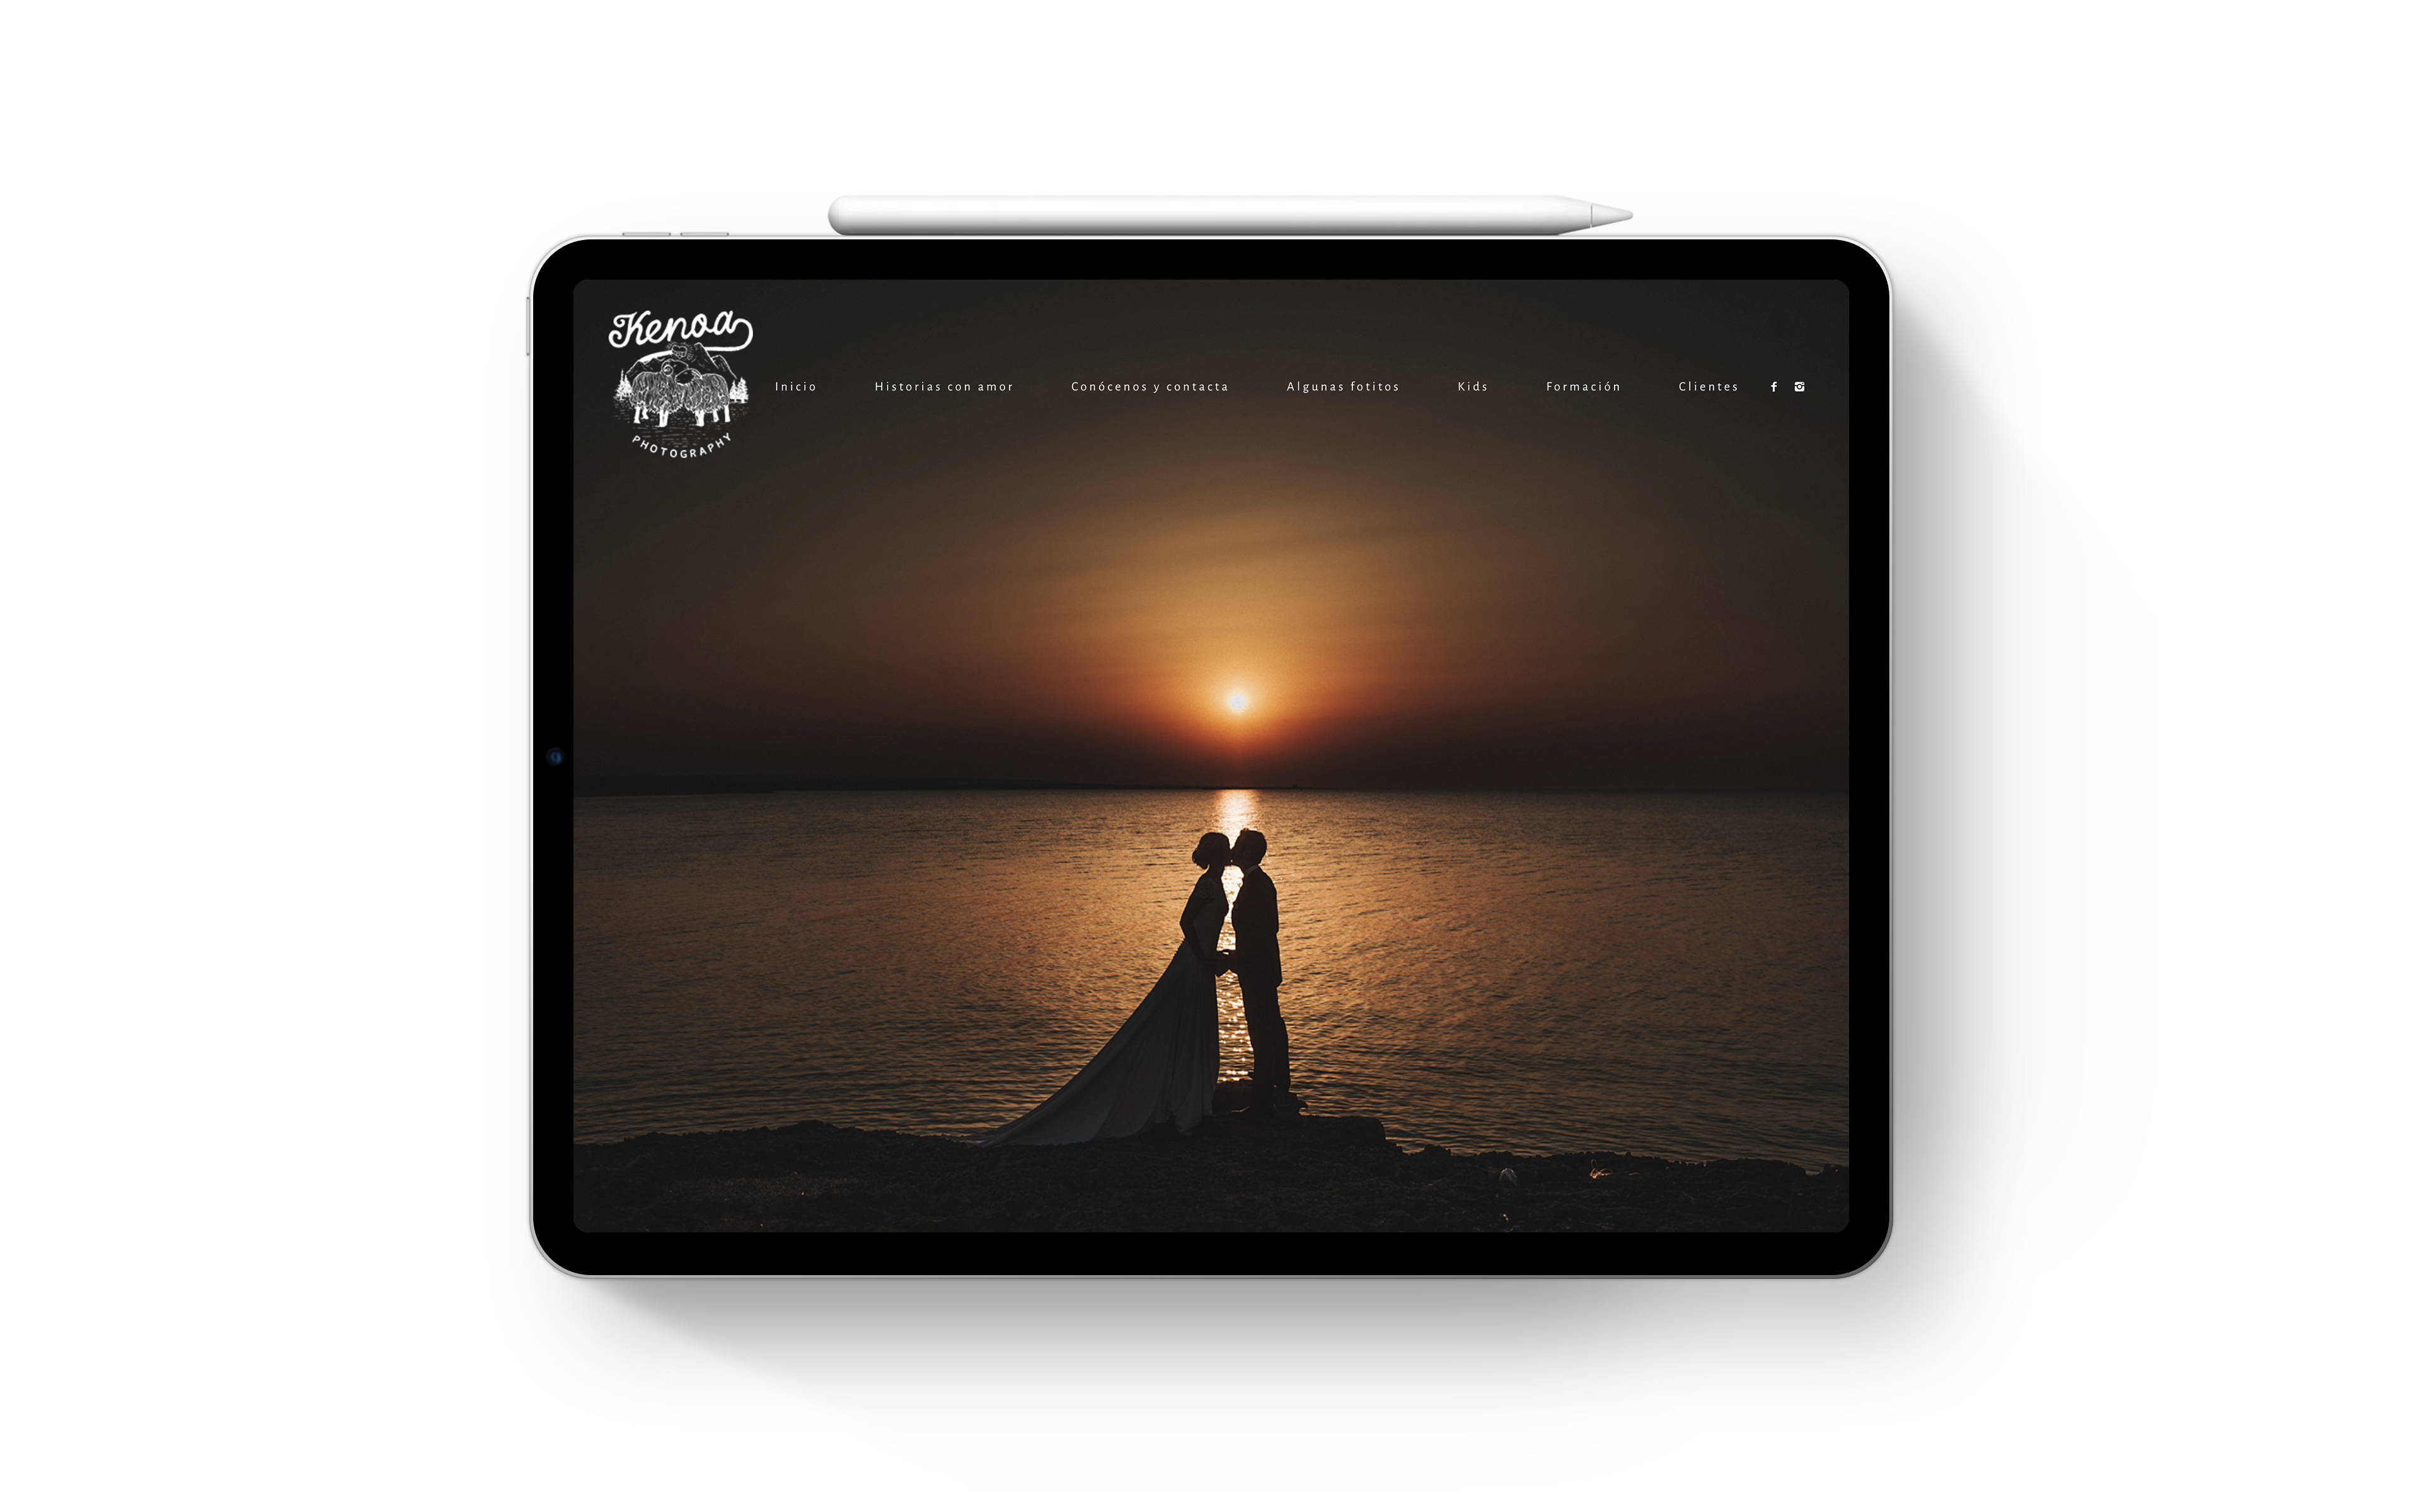 kenoa-photography-ipad-webs-para-fotografos